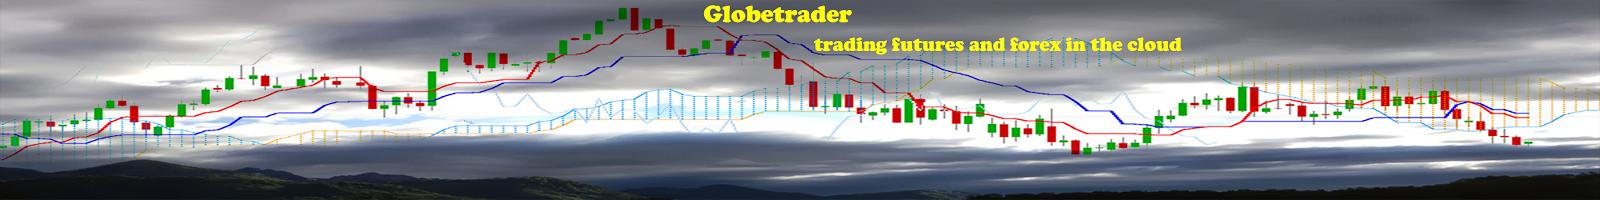 Globetrading